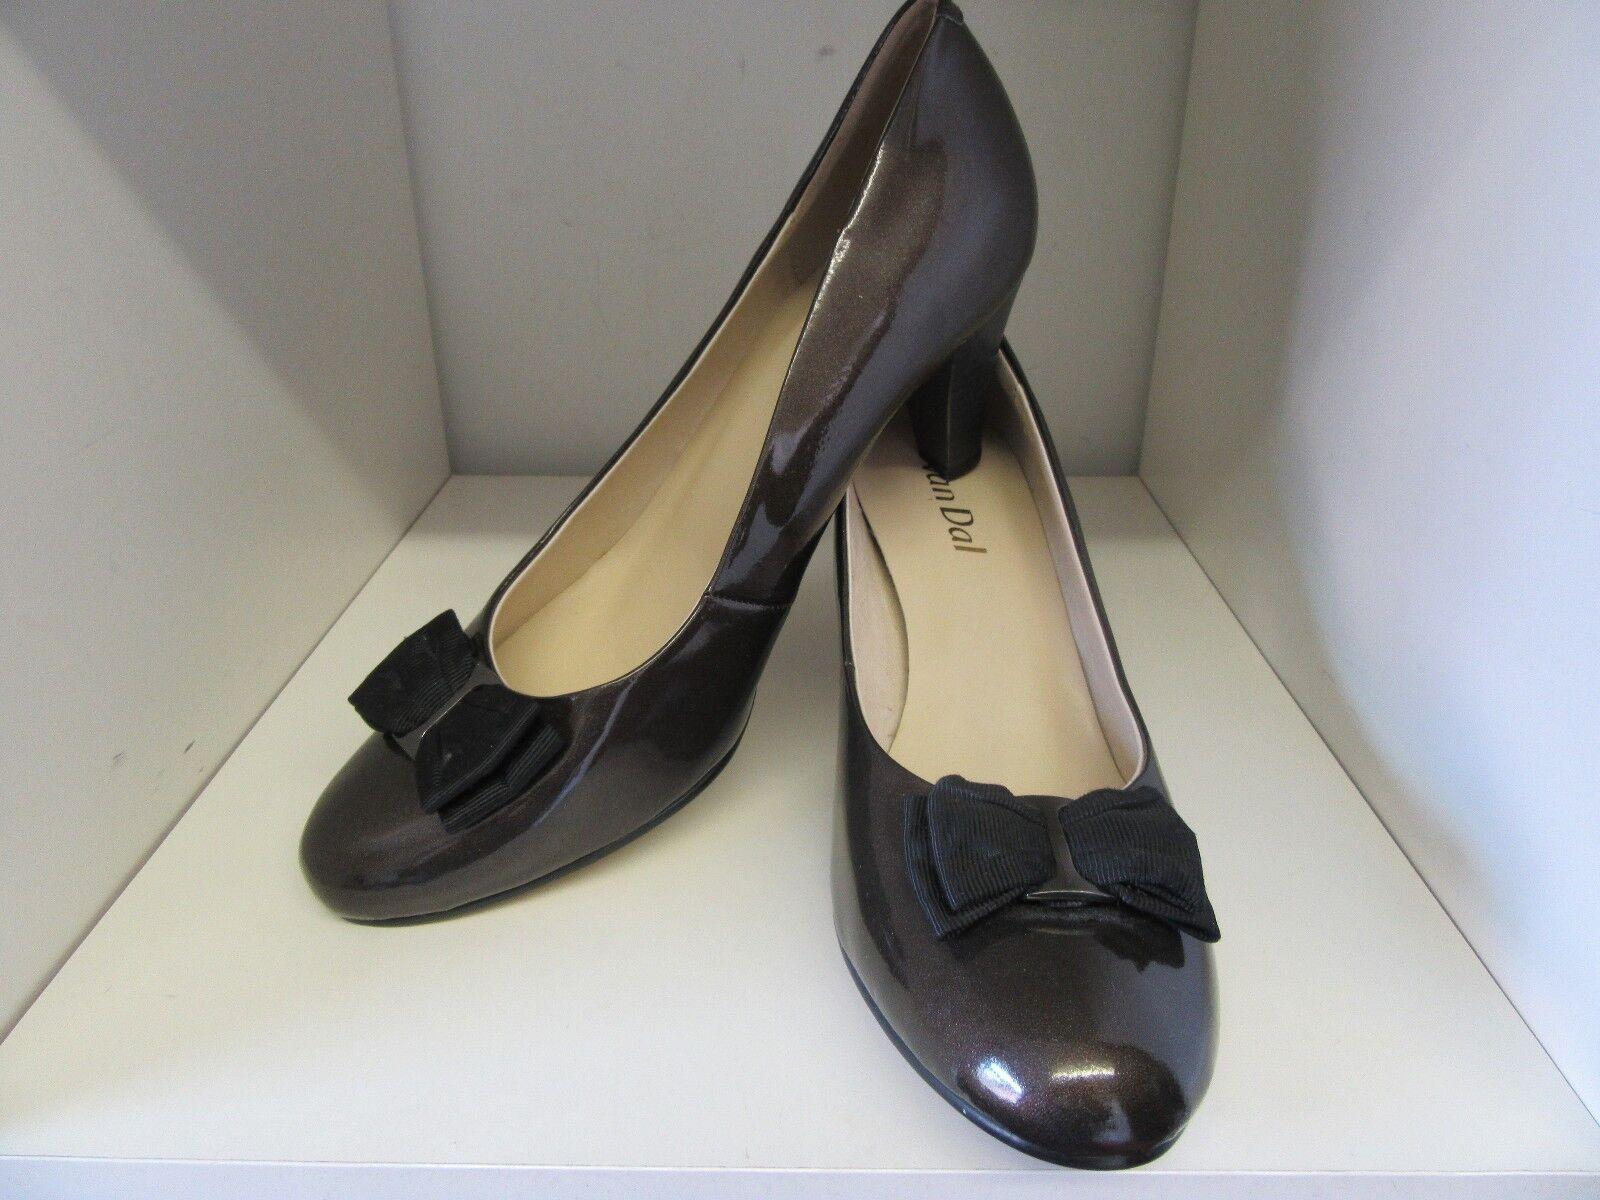 VAN DAL - BRONZE PATENT COURT Schuhe SIZE 8 - DAL 41D BRAND NEW 539f9e